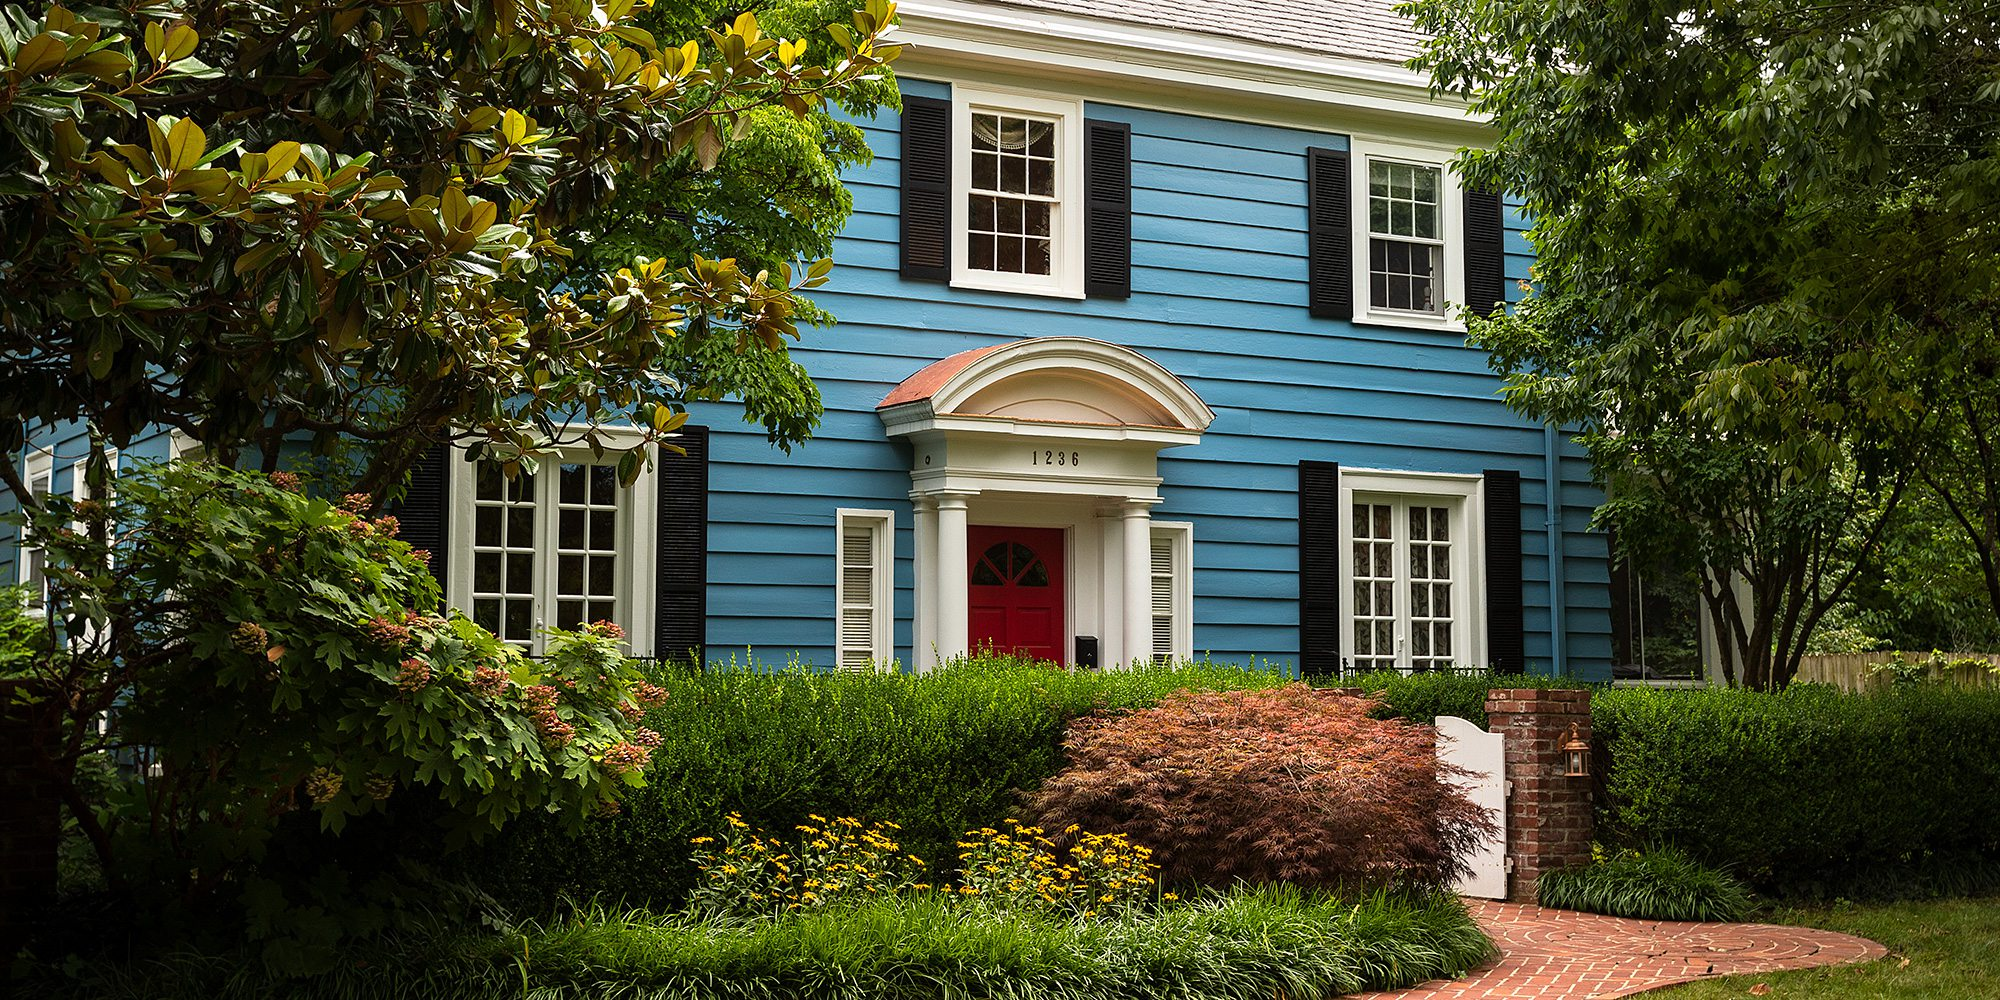 Meek's Cheerful Colonial in the in the Delaware Neighborhood in Springfield, MO